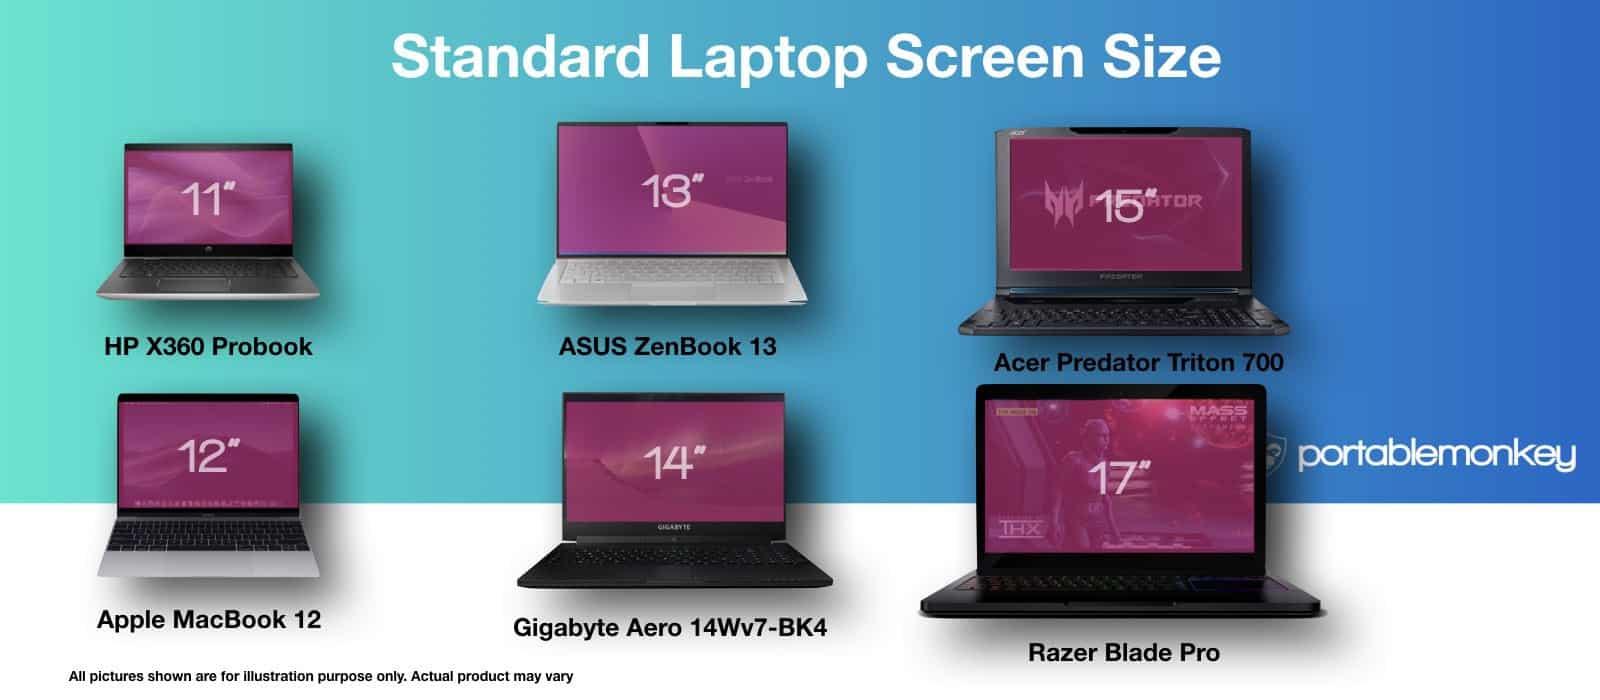 standard laptop screen size.001